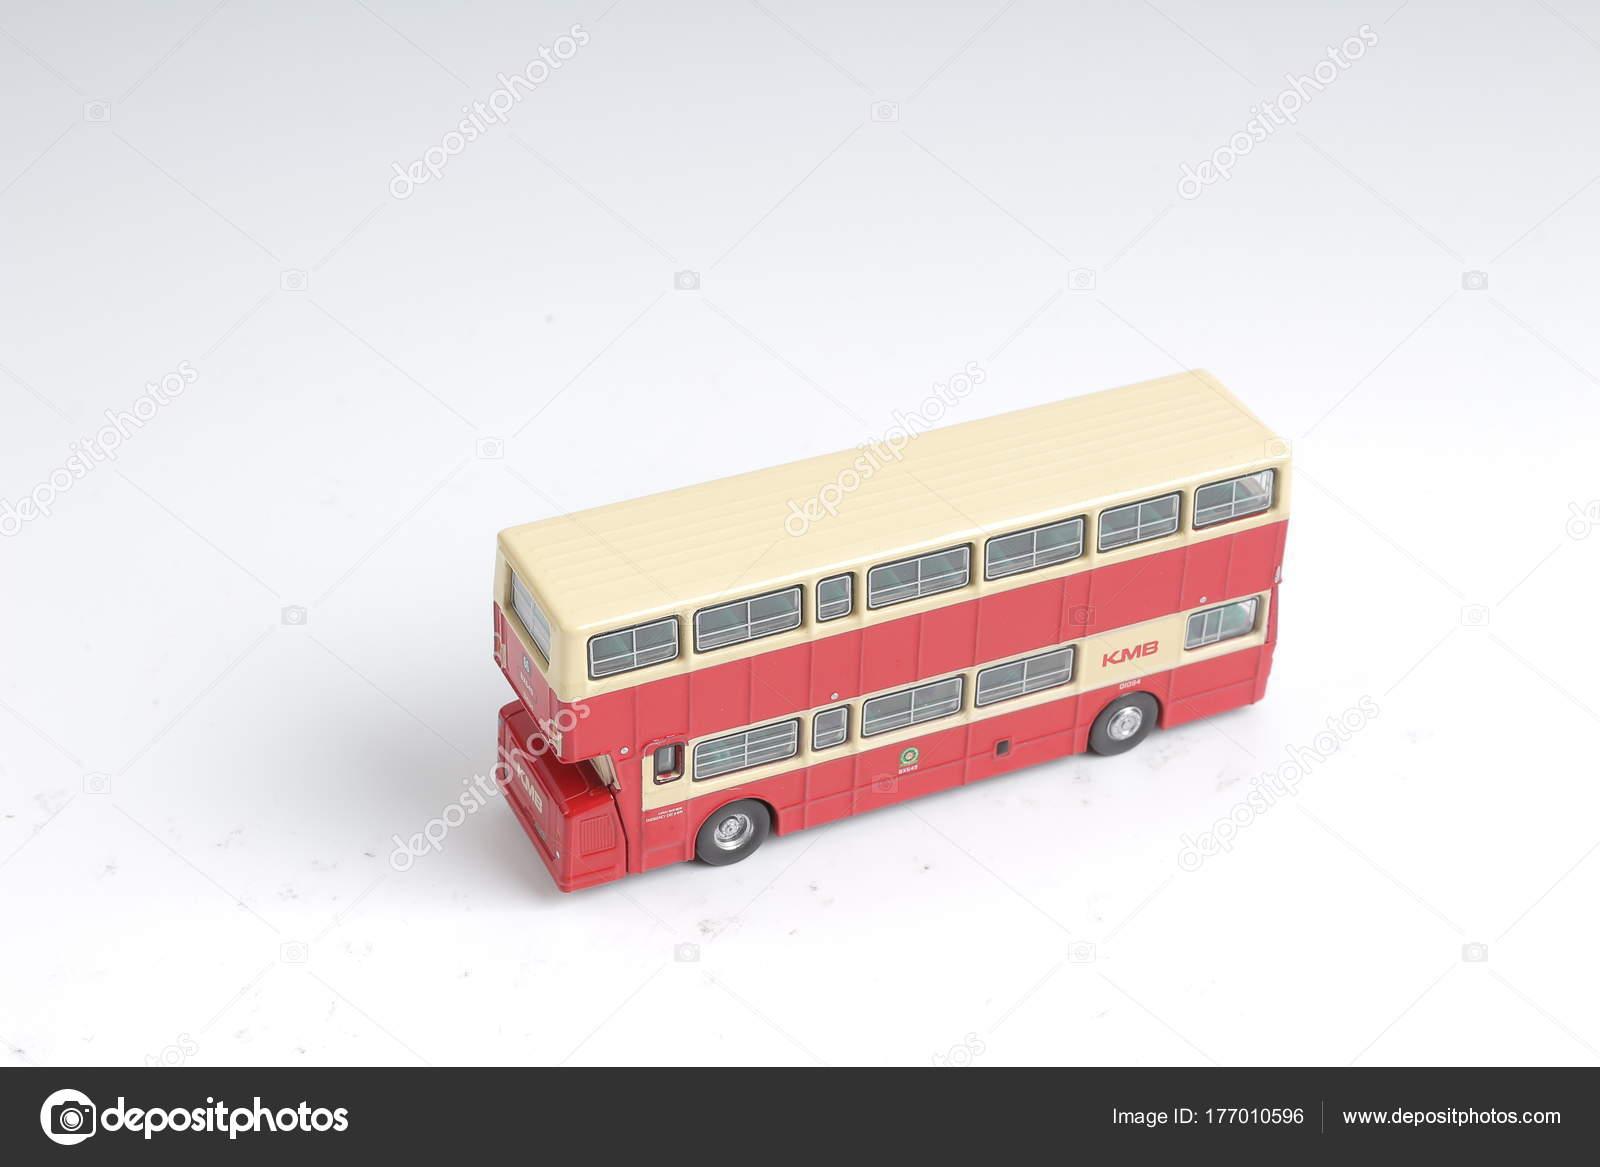 Red London Bus Spielzeug Von Hk Modell Redaktionelles Stockfoto Das Des Foto Sameashkyahoocomhk